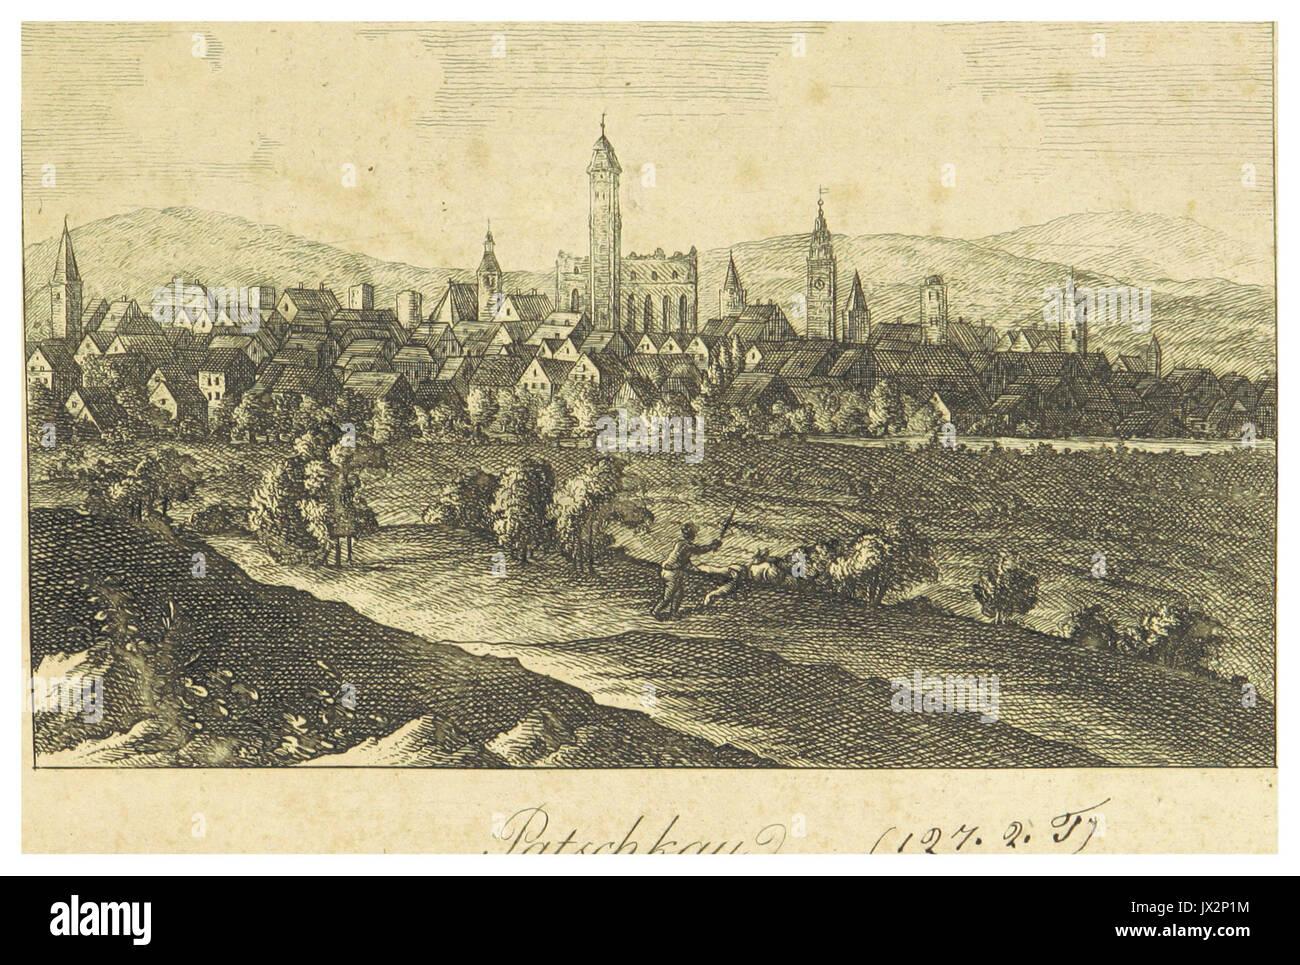 FISCHER, STUCKART(1819) Schlesien p044 Patschkau Foto de stock